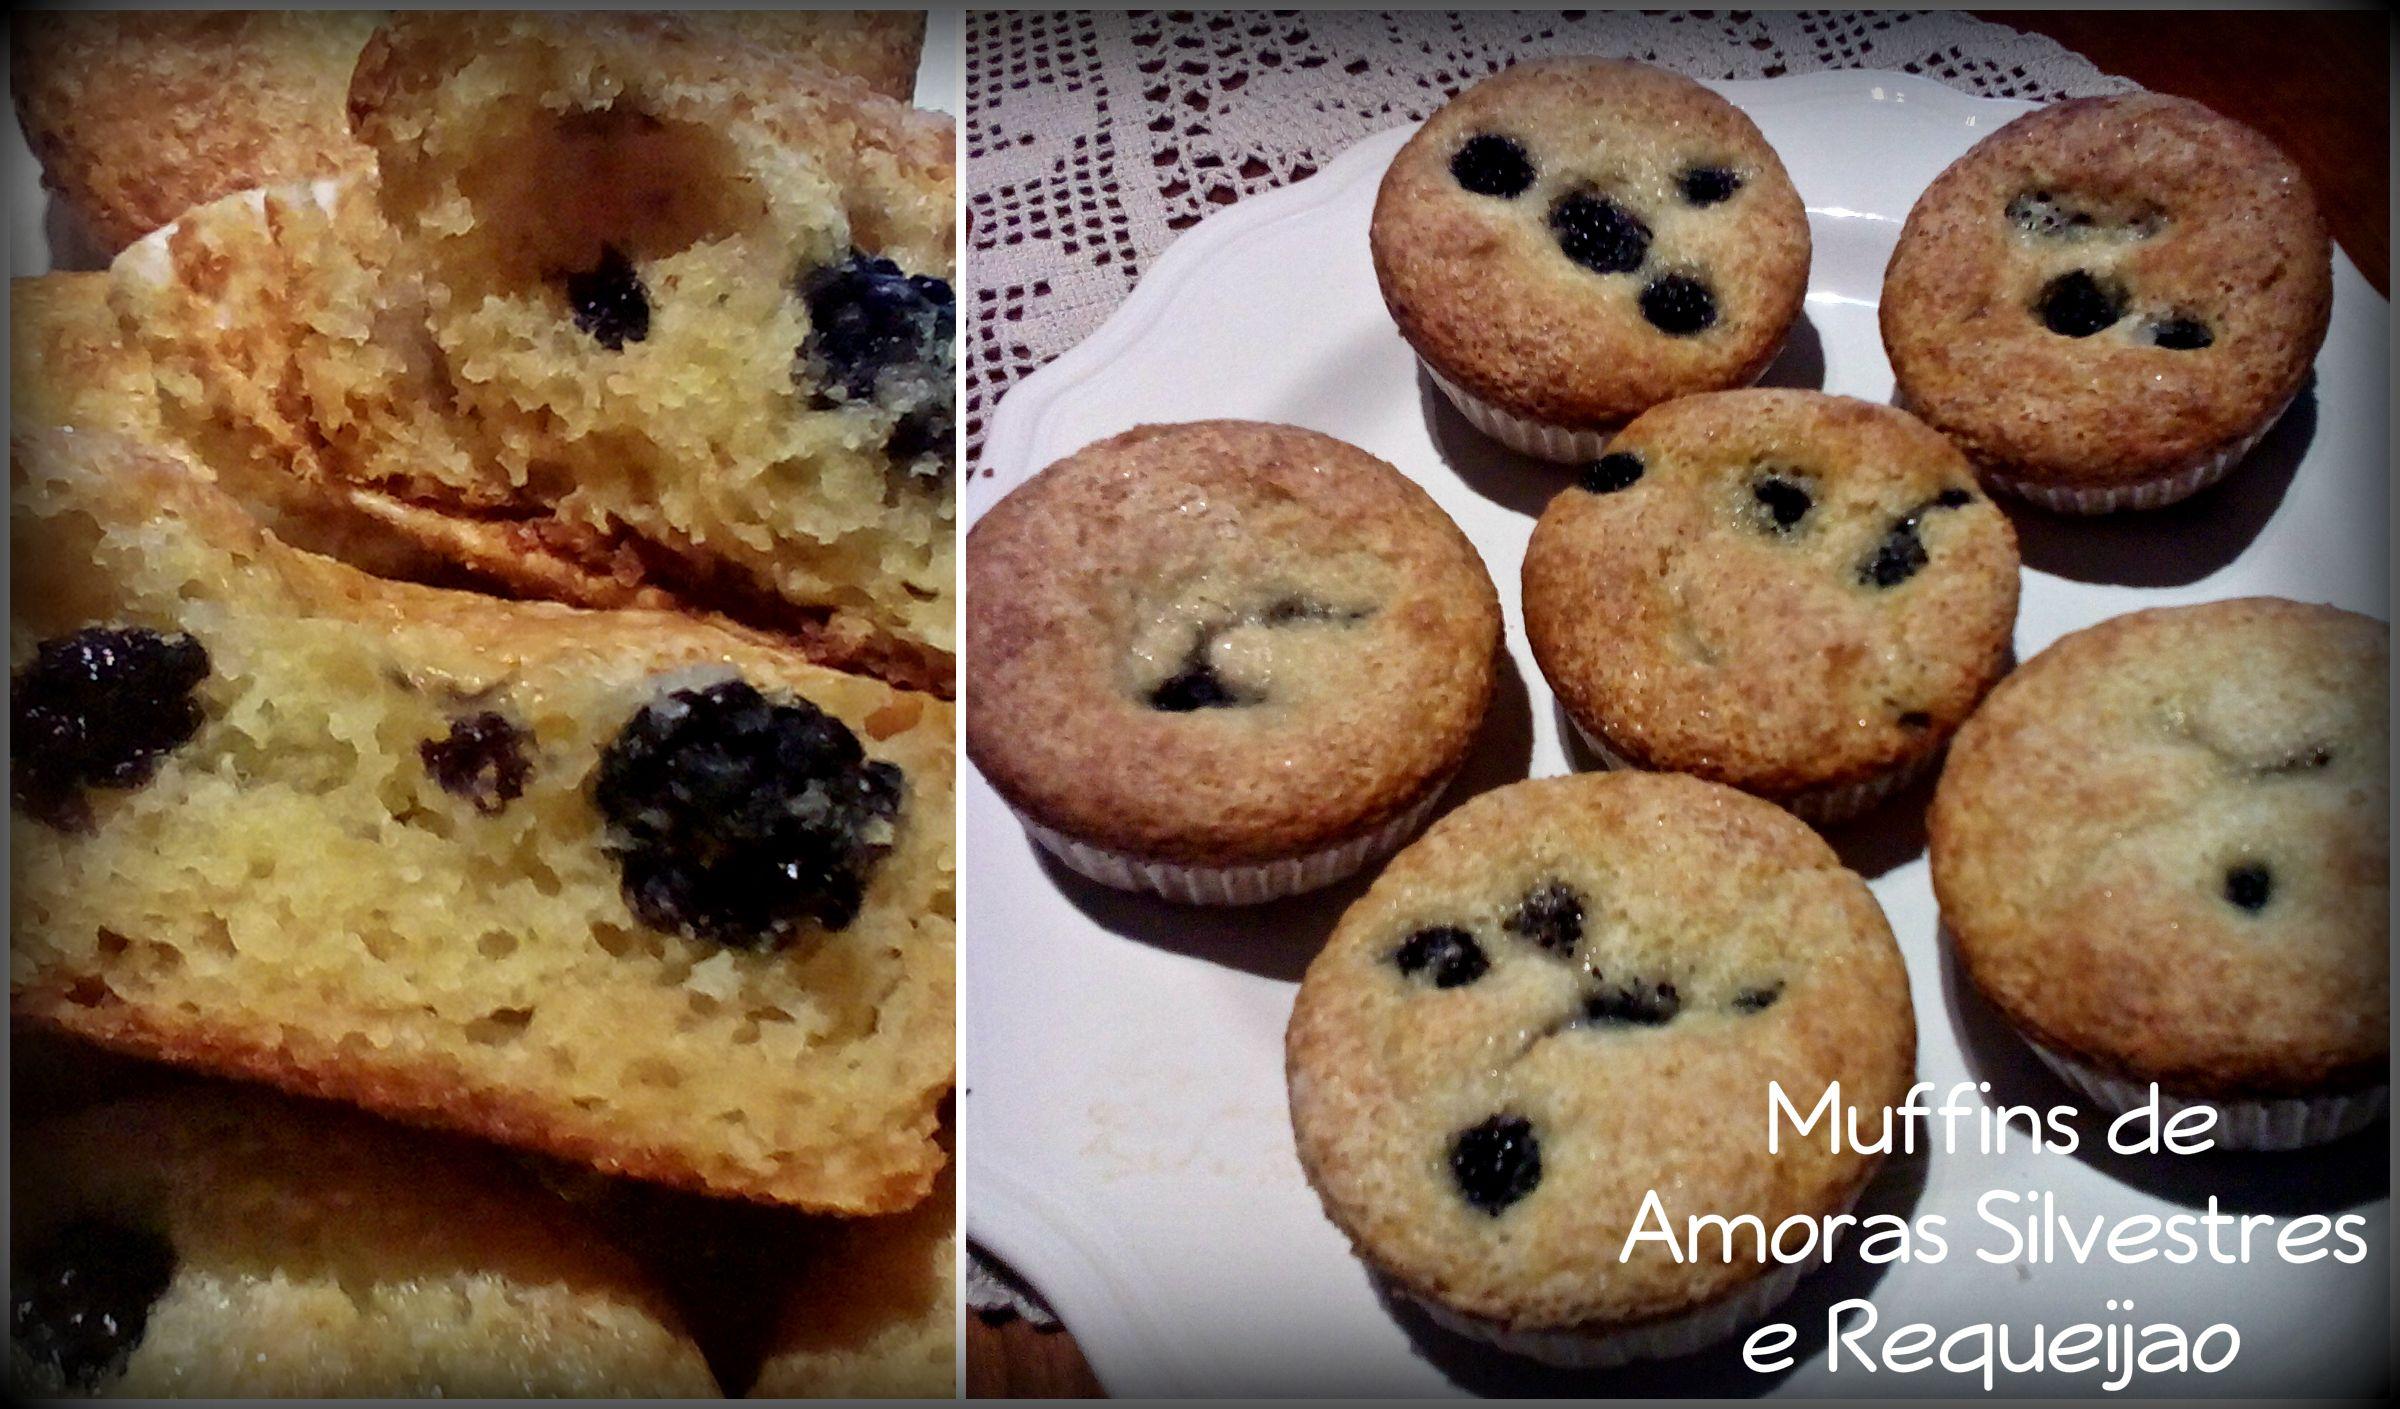 muffinsdeamoras.jpg.jpg